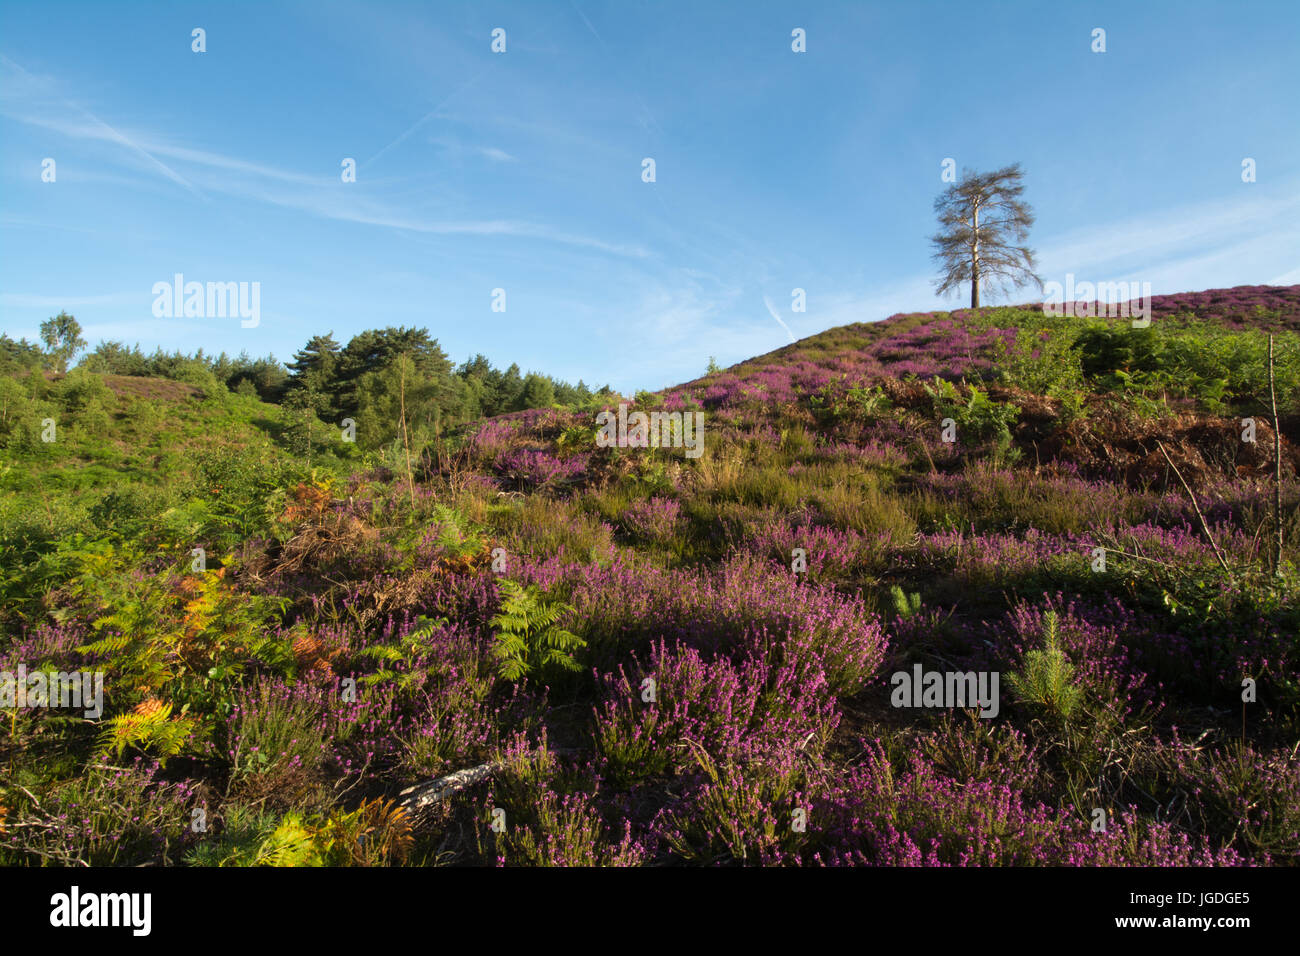 Blick über Ambersham Common in den South Downs National Park im Sommer mit lila Heidekraut und sanften Hügeln Stockbild